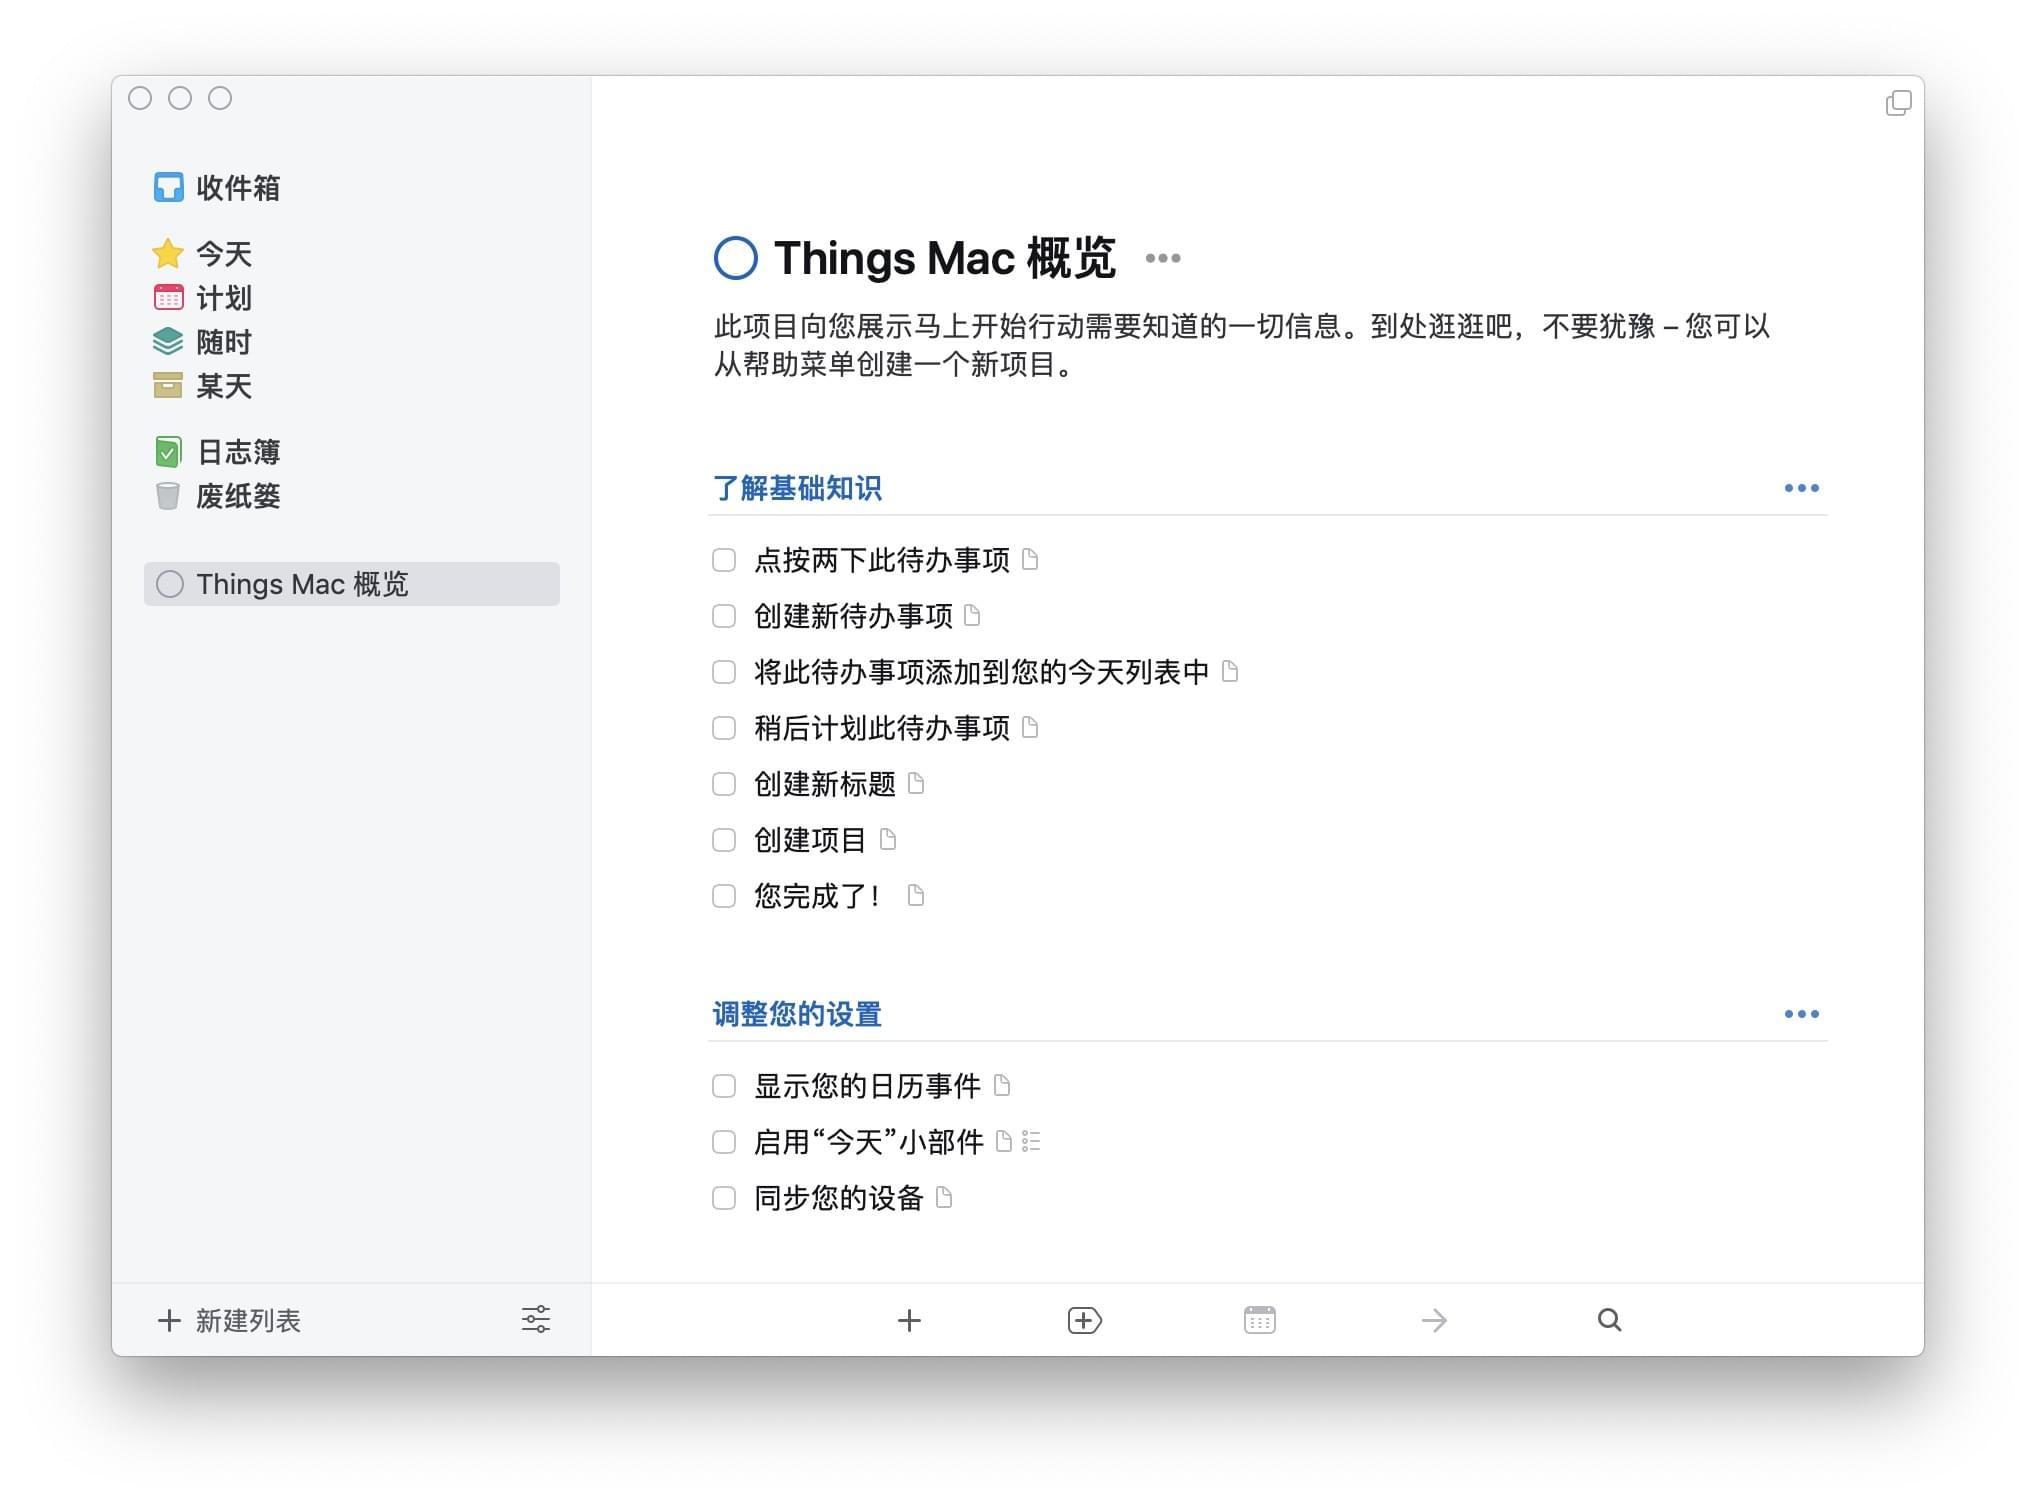 Tings3 for mac示教学例项目